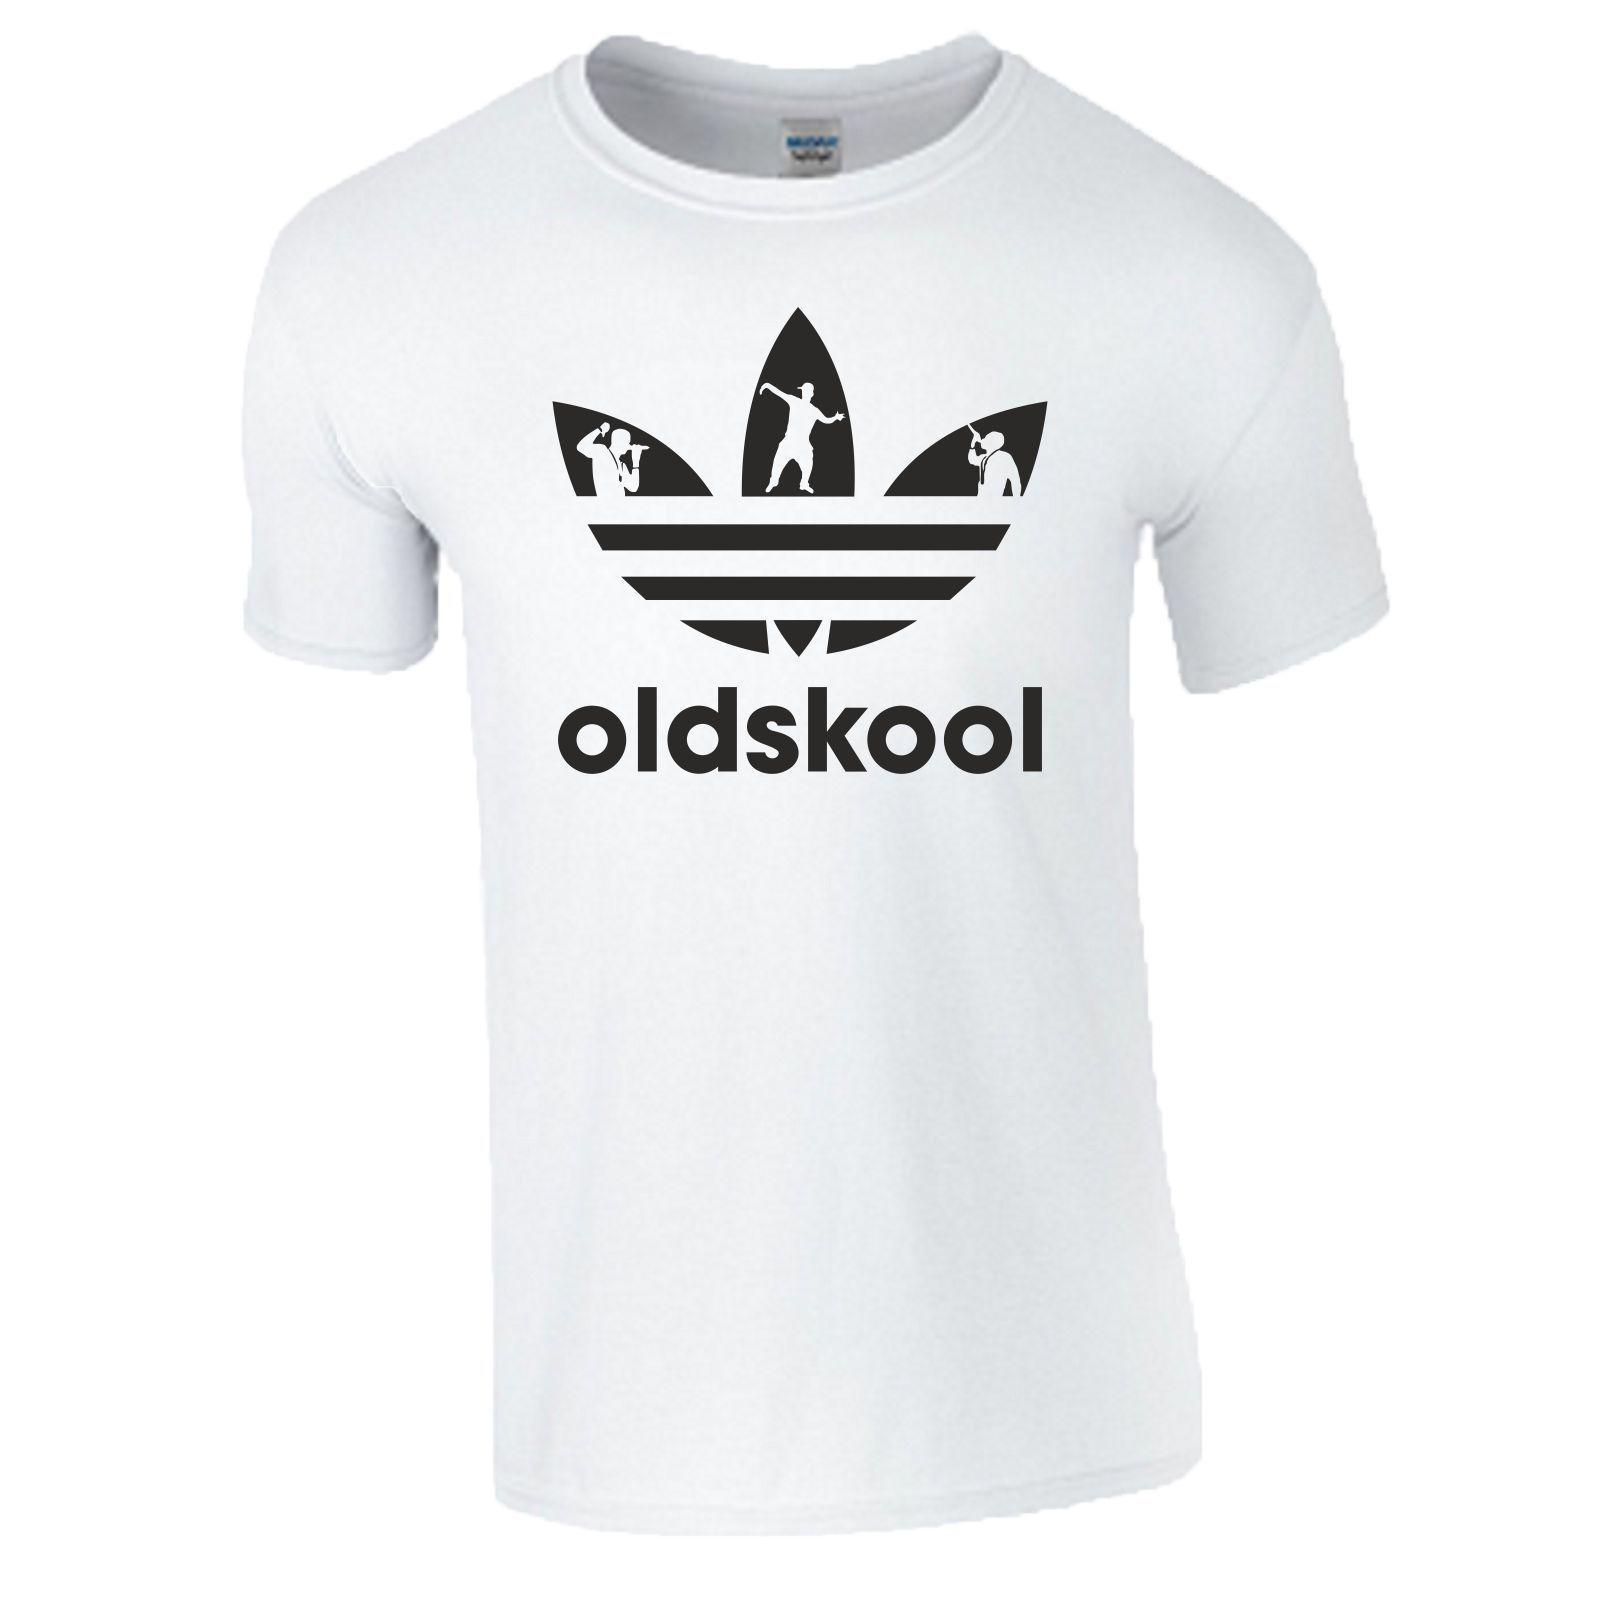 Xmas Oldschool Old Skool Juko T-Shirt DJ Dance Festival Youth Boy Girl Kids Top Birthday Gift Party Acid House Rave